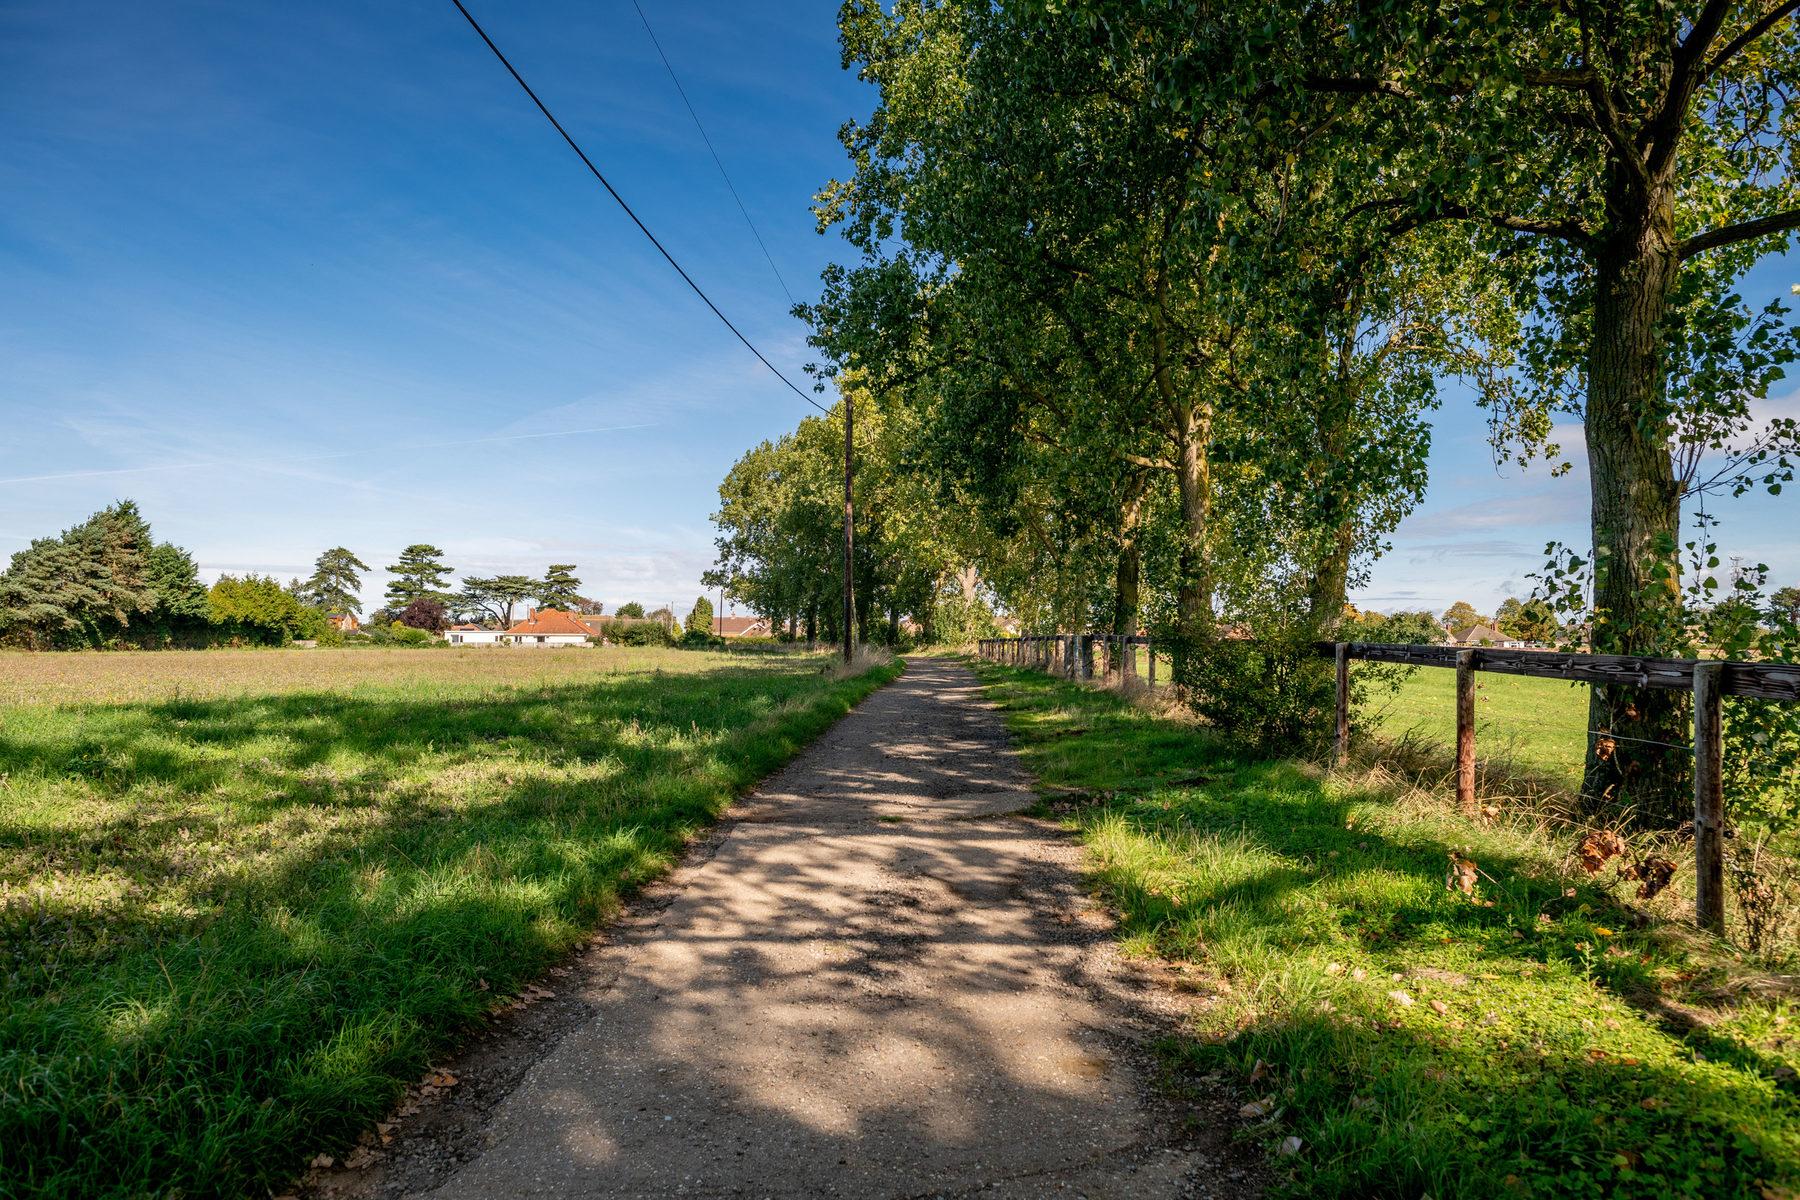 033 Howdale Rabbit Lane 2018